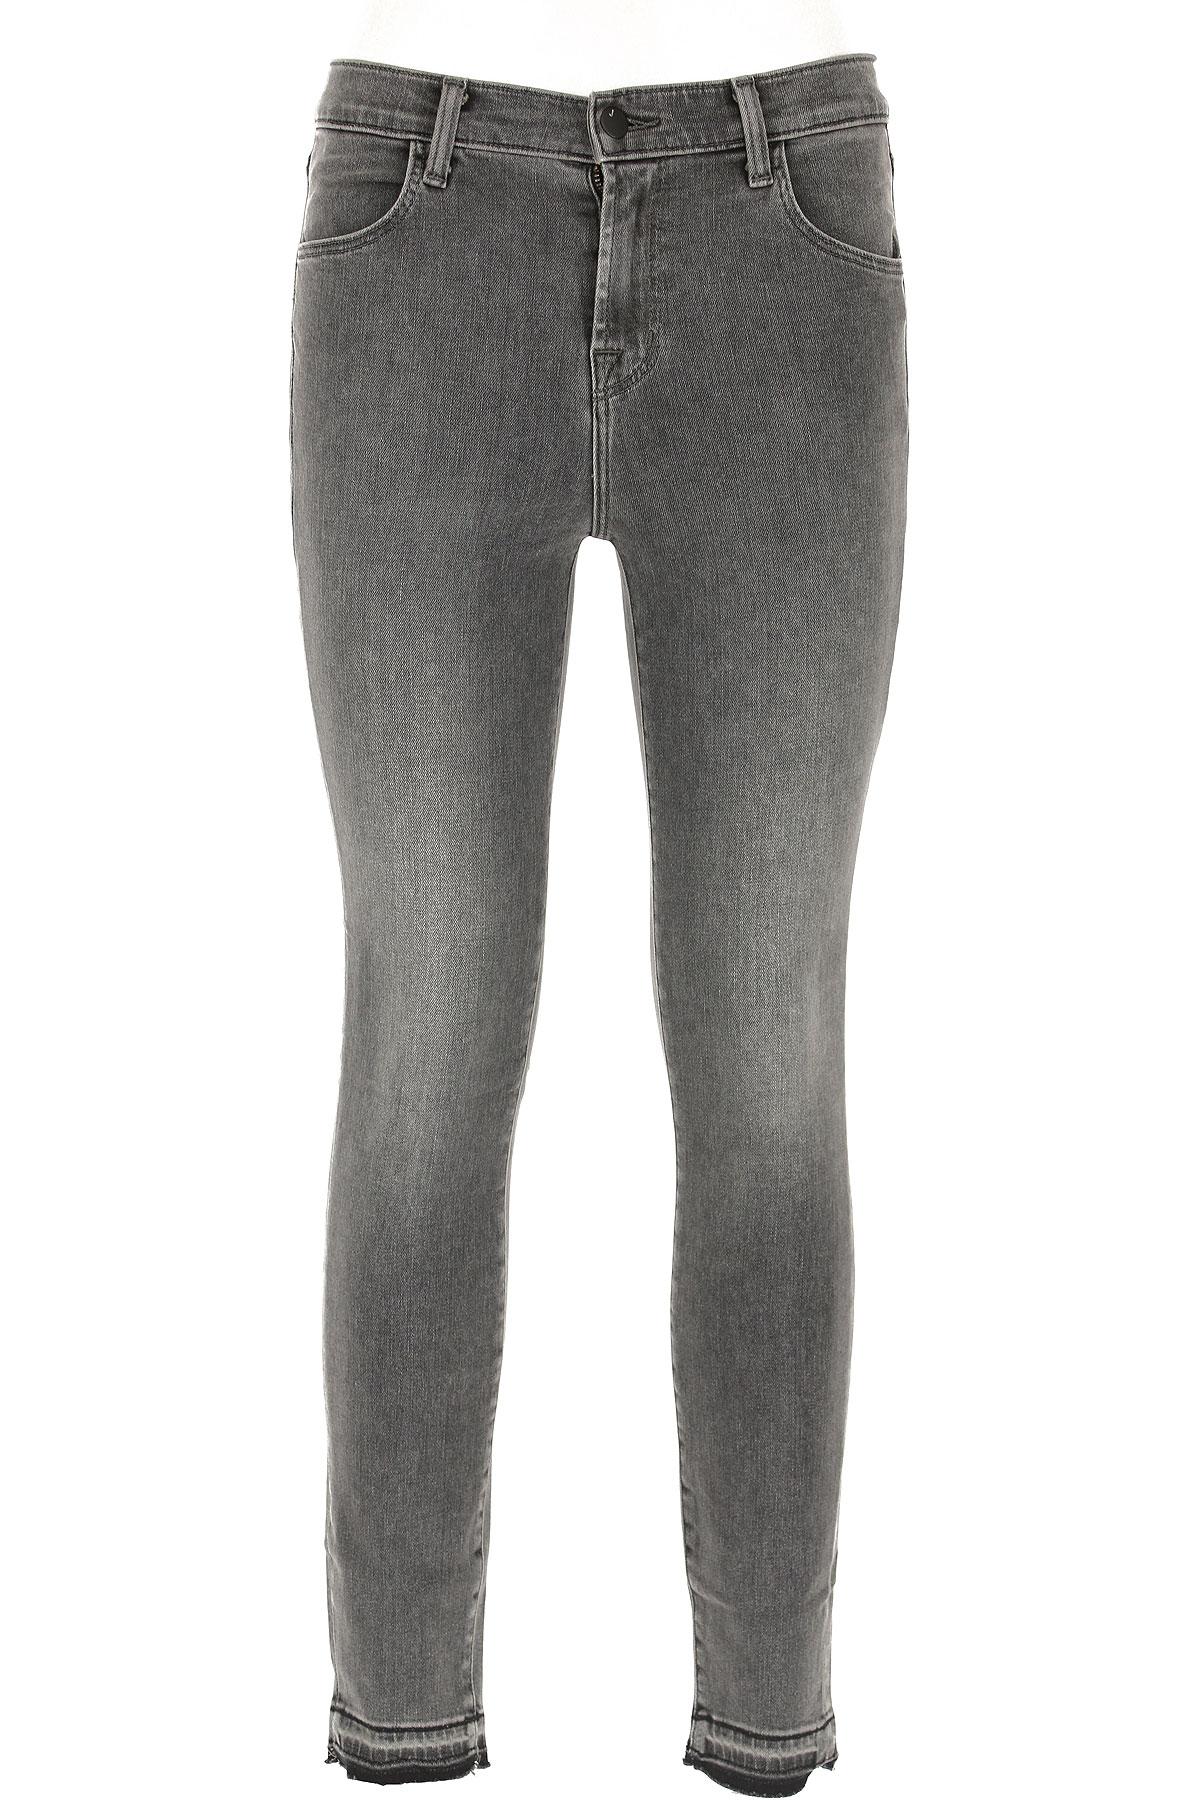 Image of J Brand Jeans, Dark Grey, Cotton, 2017, 24 26 27 28 29 30